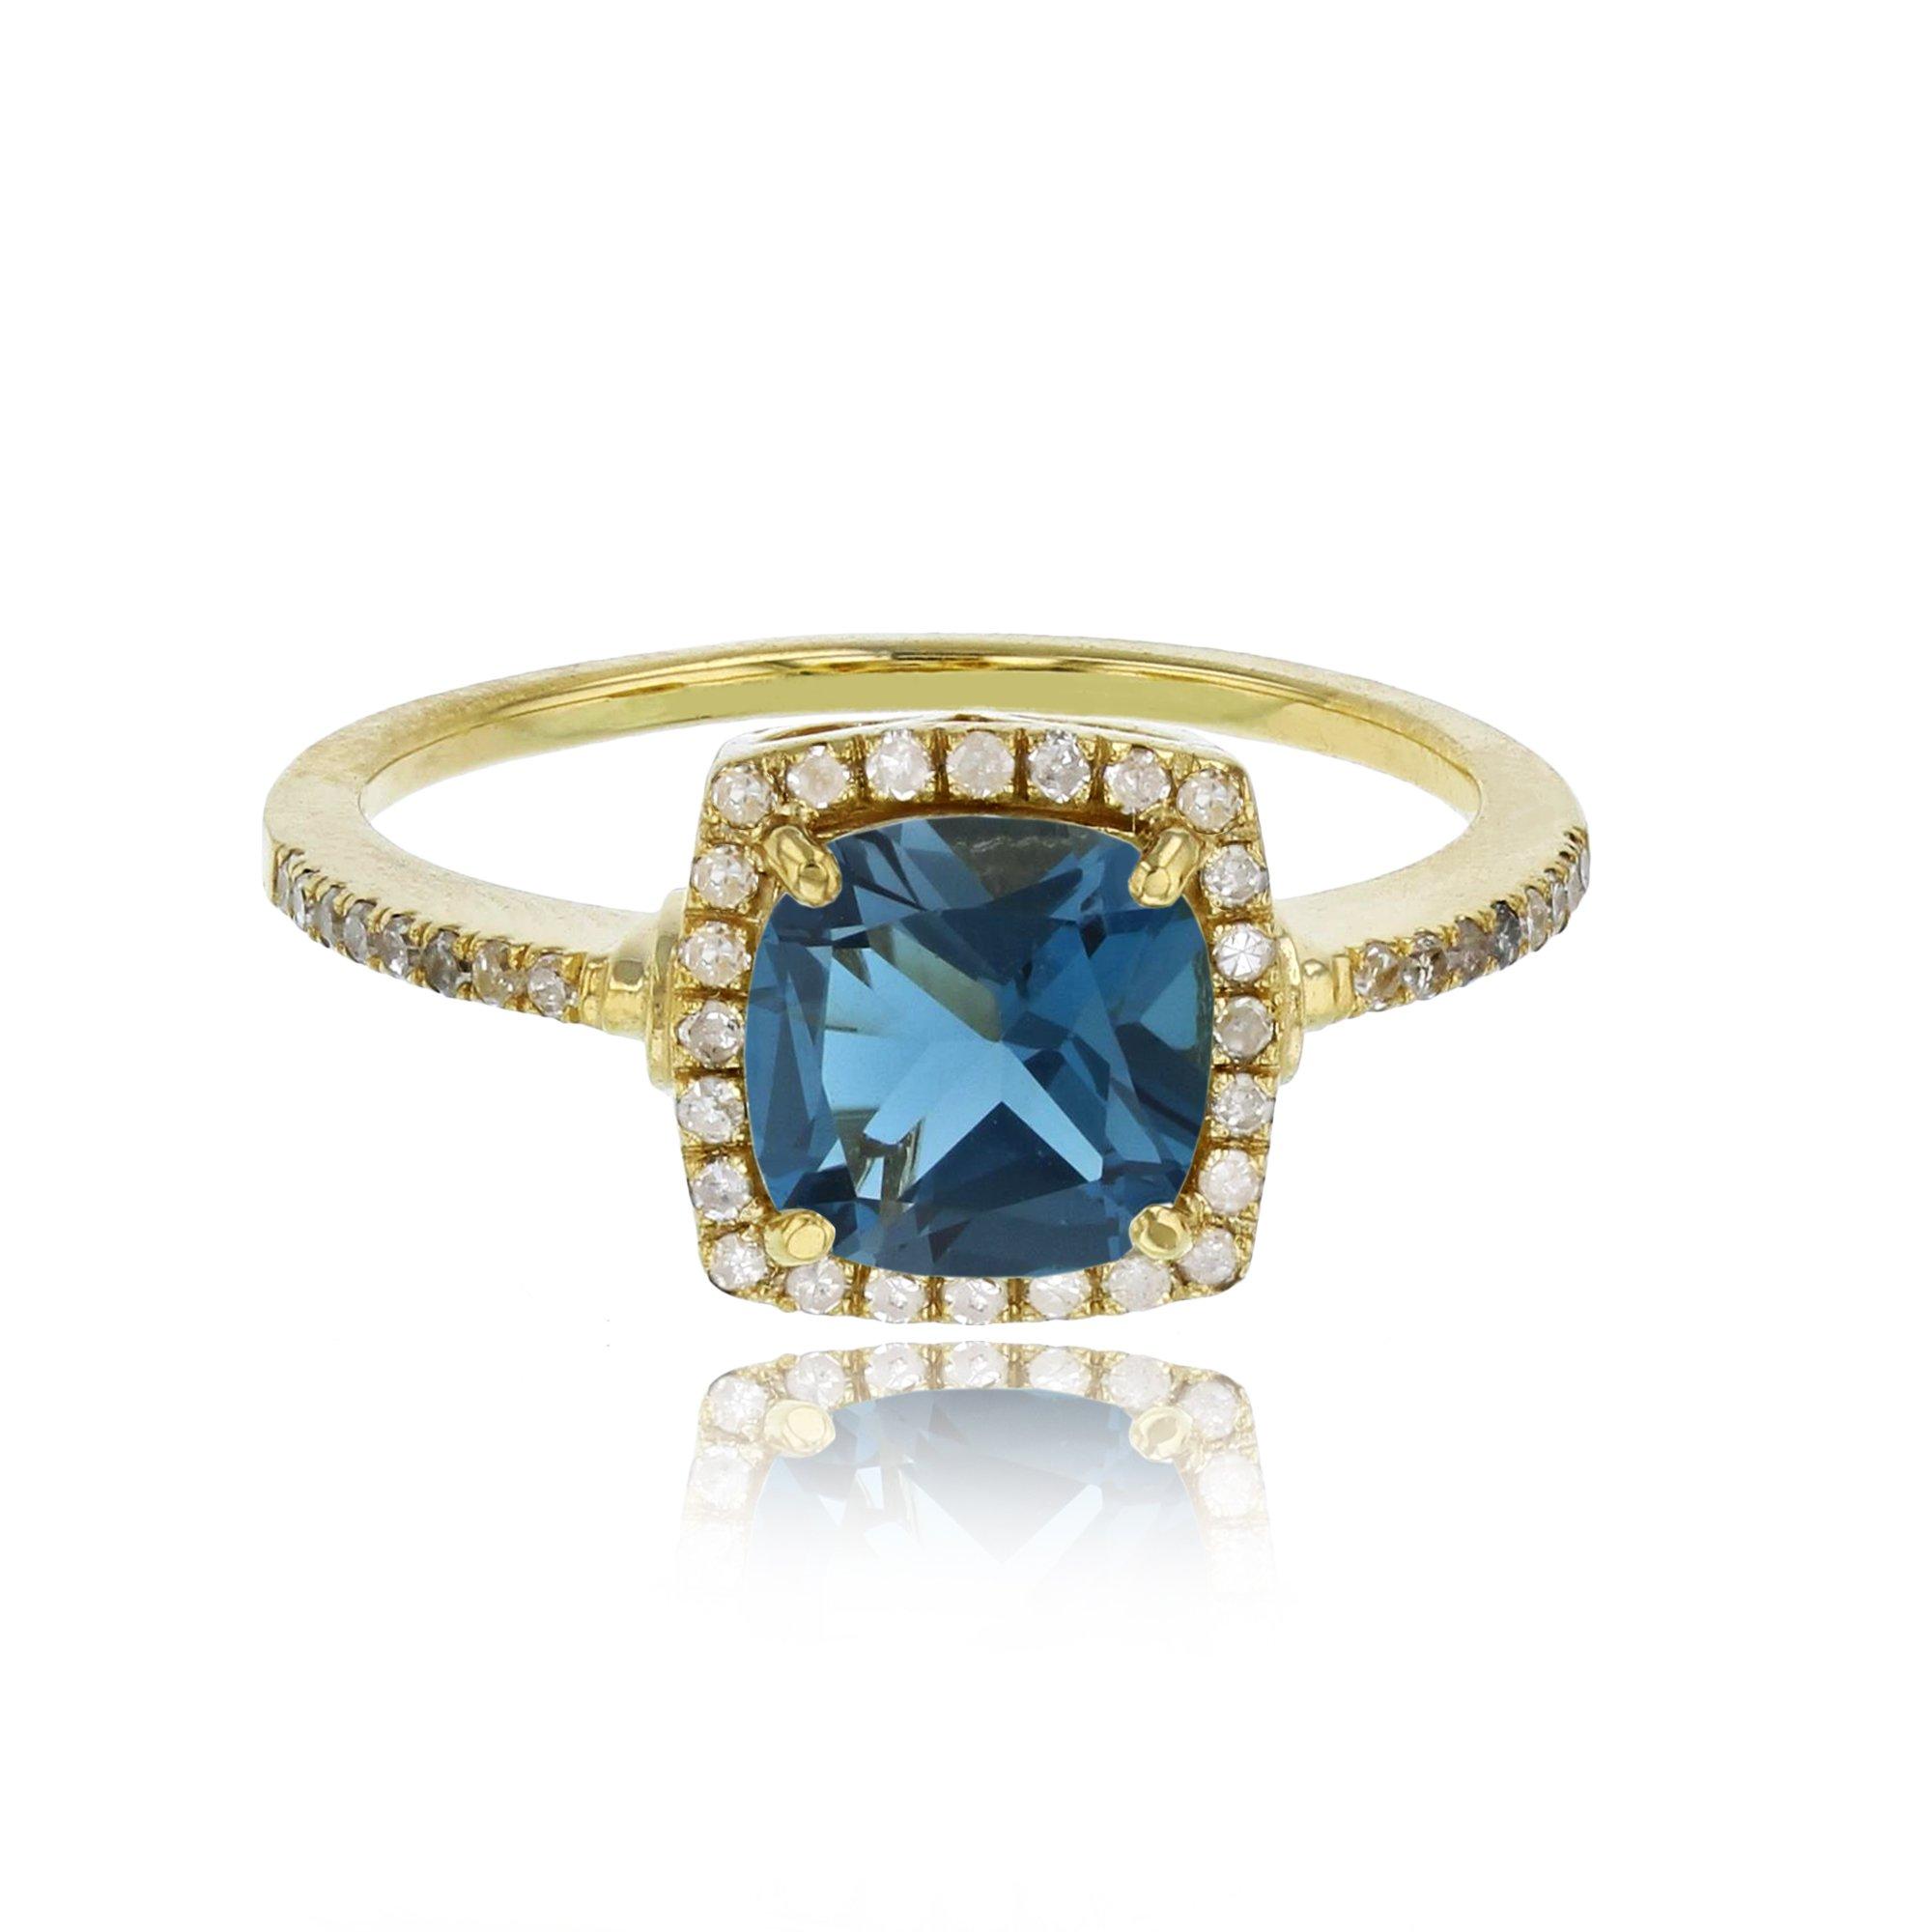 14K Yellow Gold 7mm Cushion London Blue Topaz & 0.20 CTTW Diamond Halo Ring by Decadence